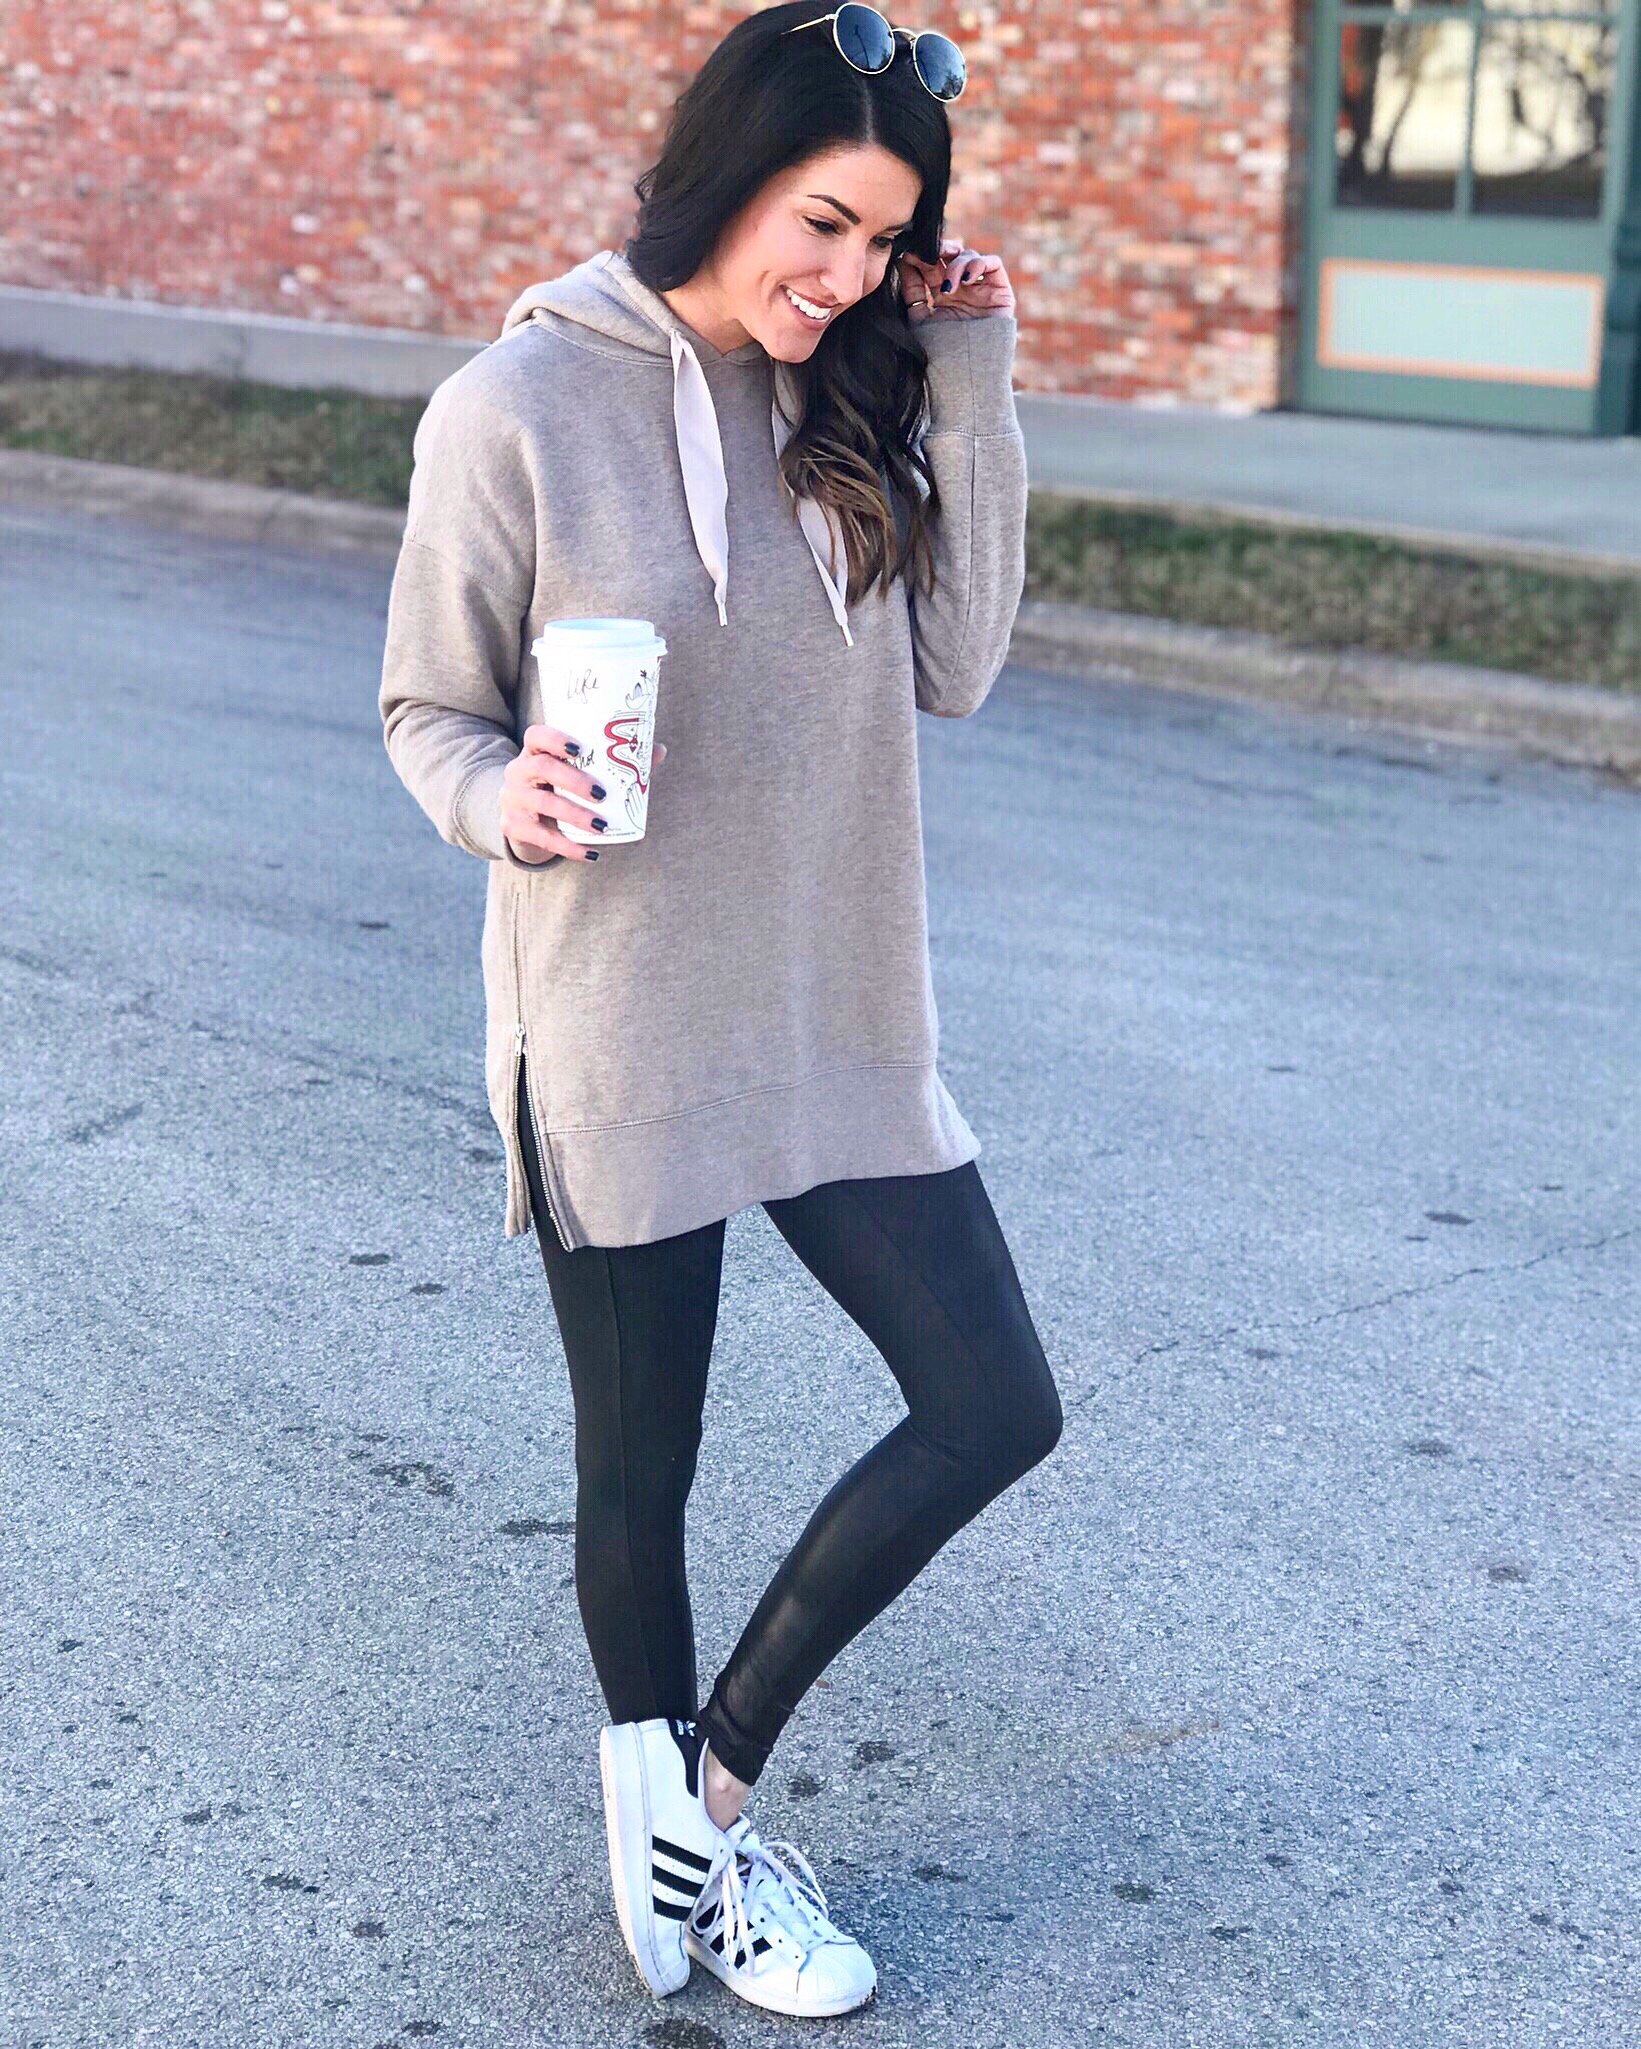 Oversized sweater and black leggings